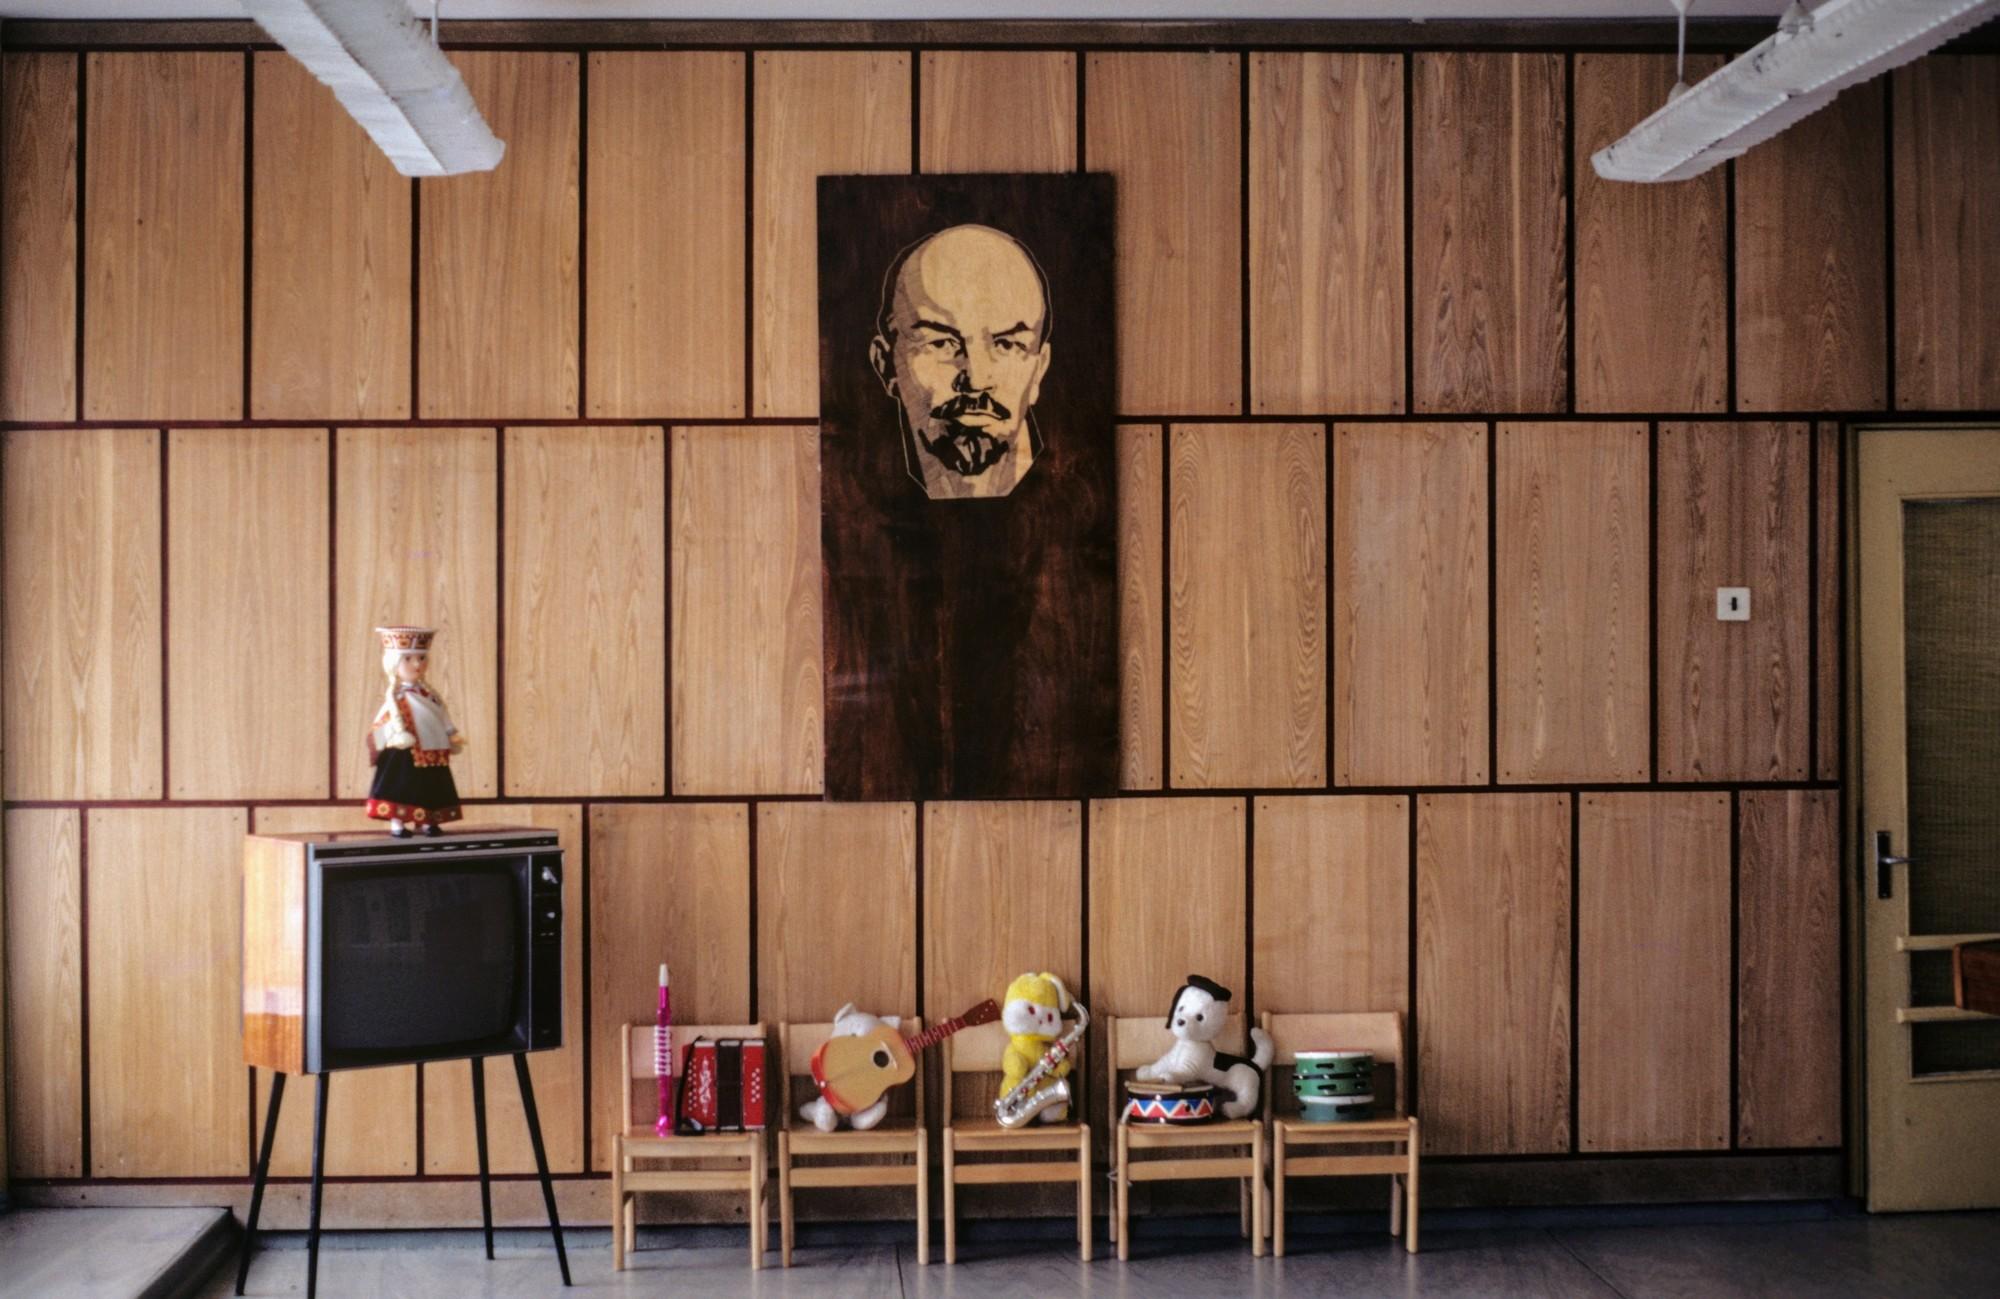 Ms2020_001_BurtonDoug_B1_F8_7_1979_Soviet_Union_011.jpg